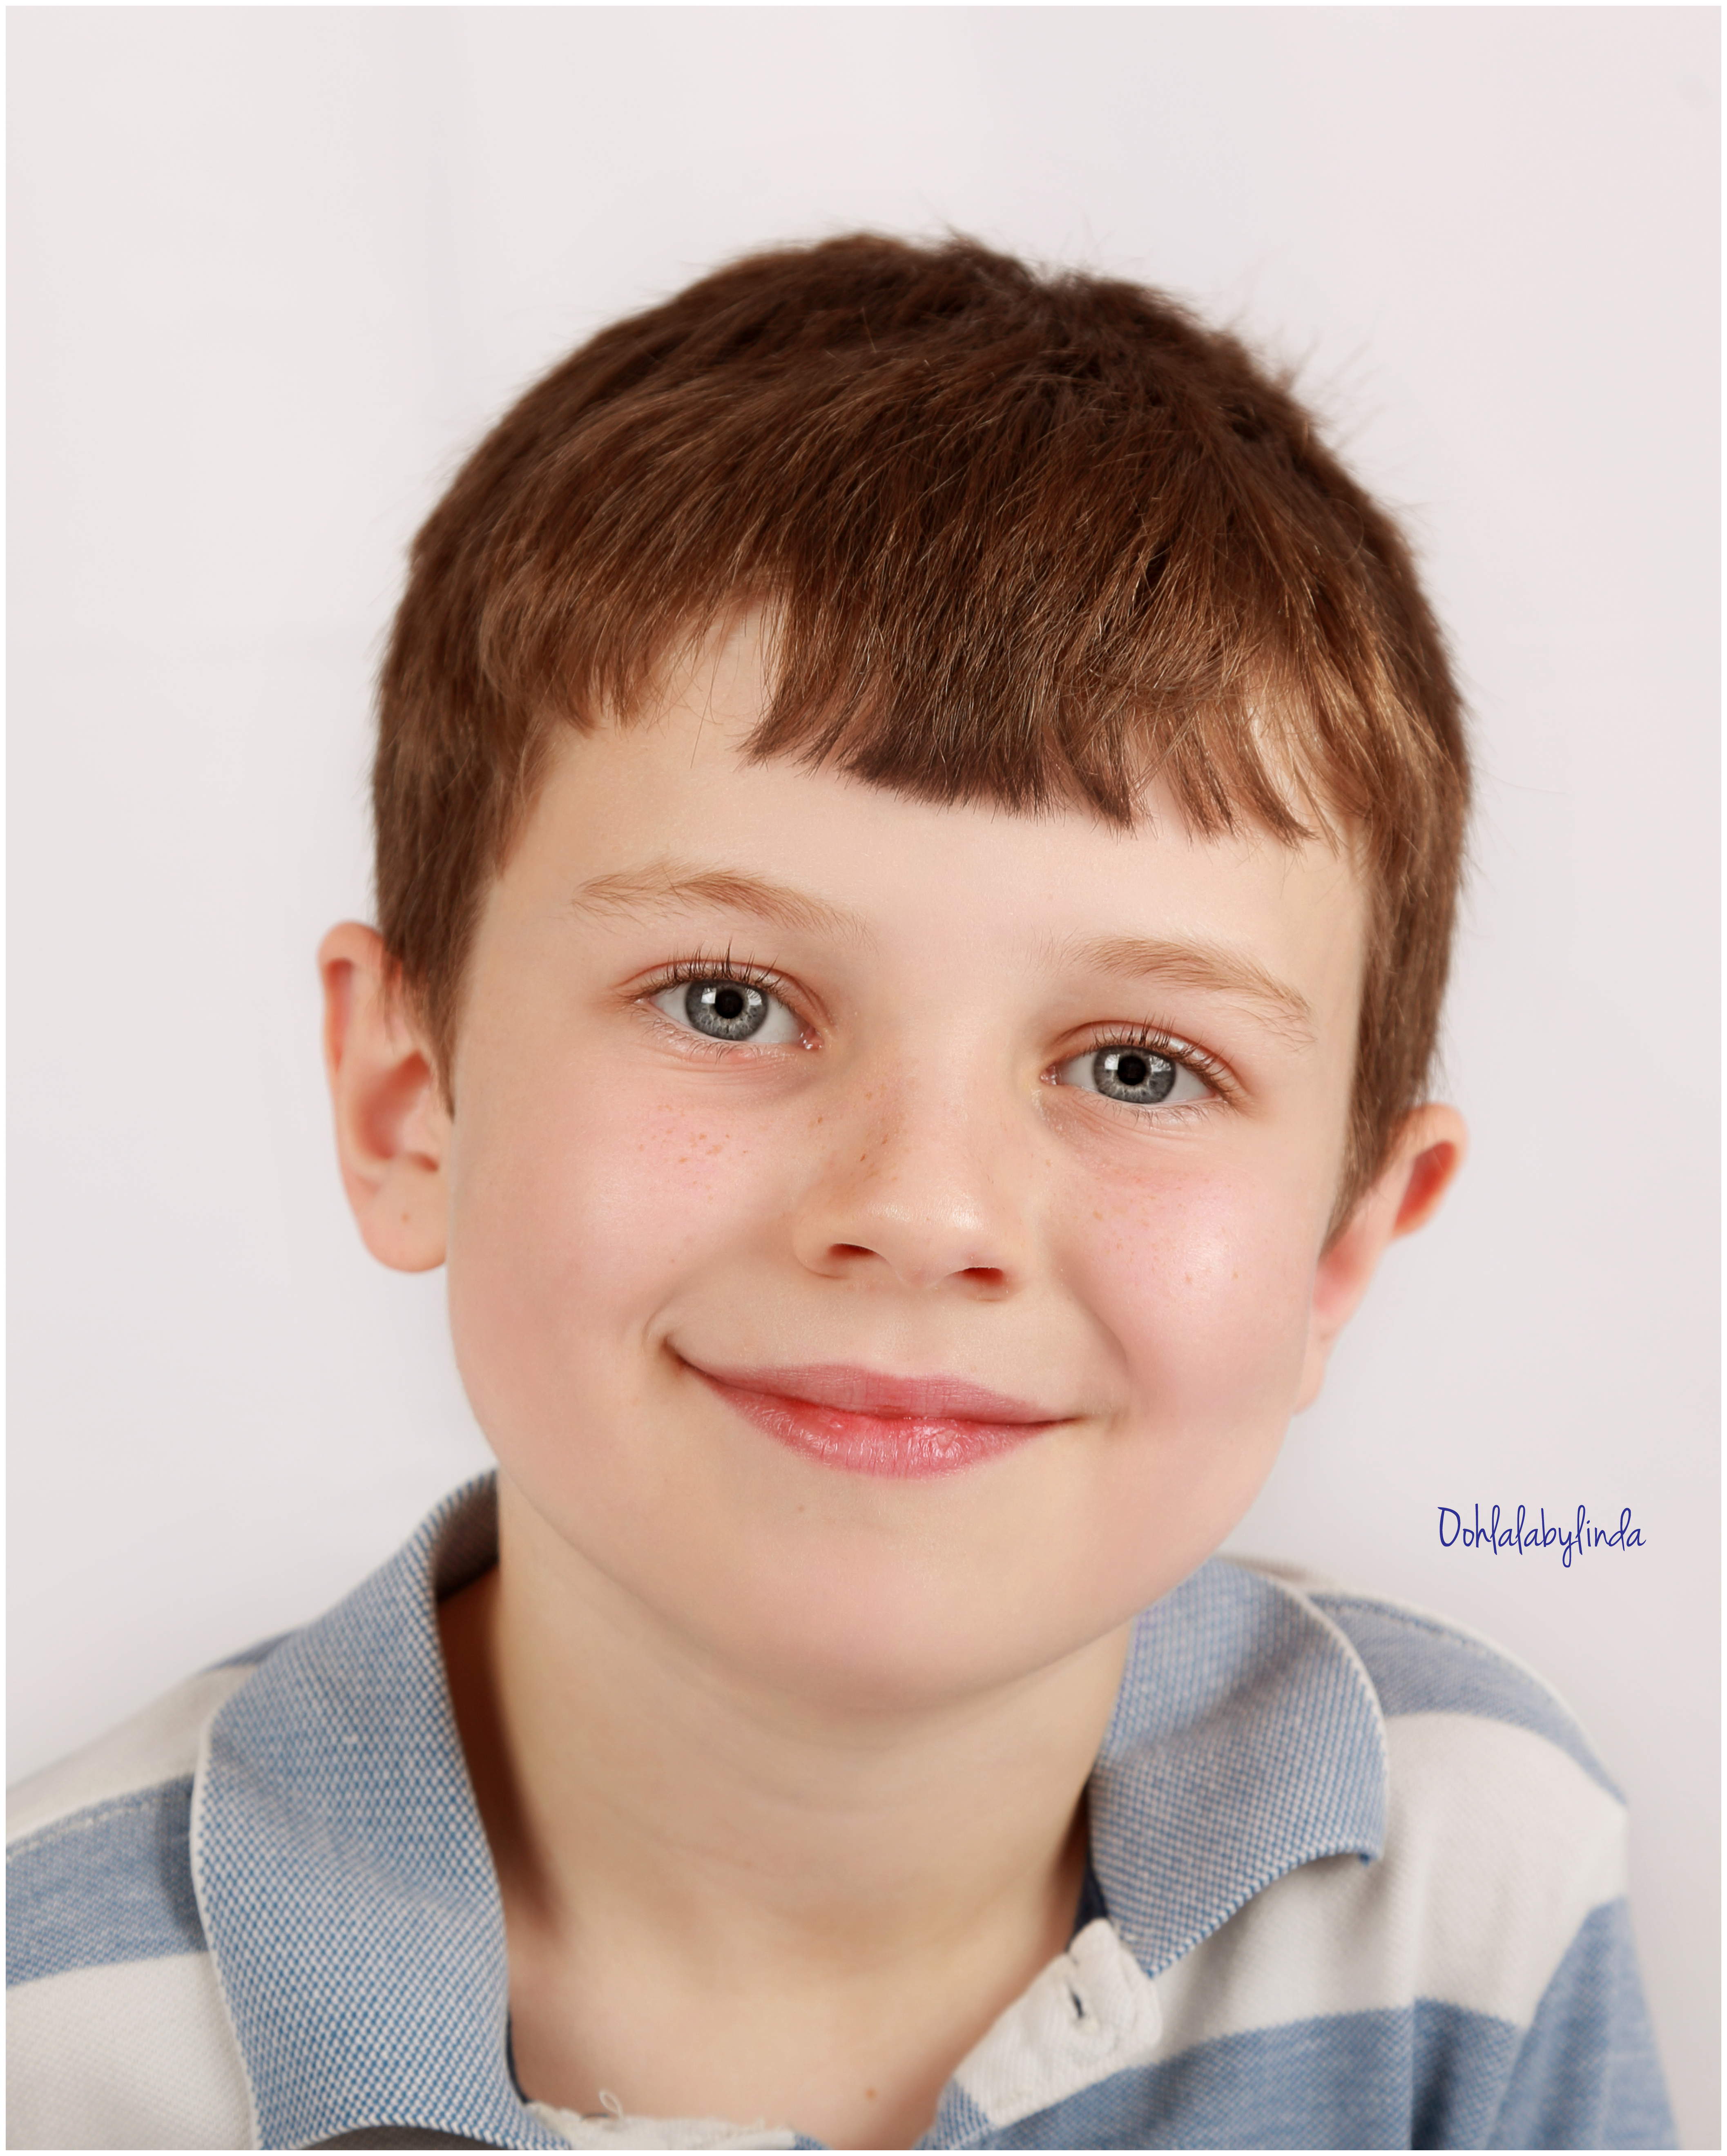 Head and shoulders portrait of little boy